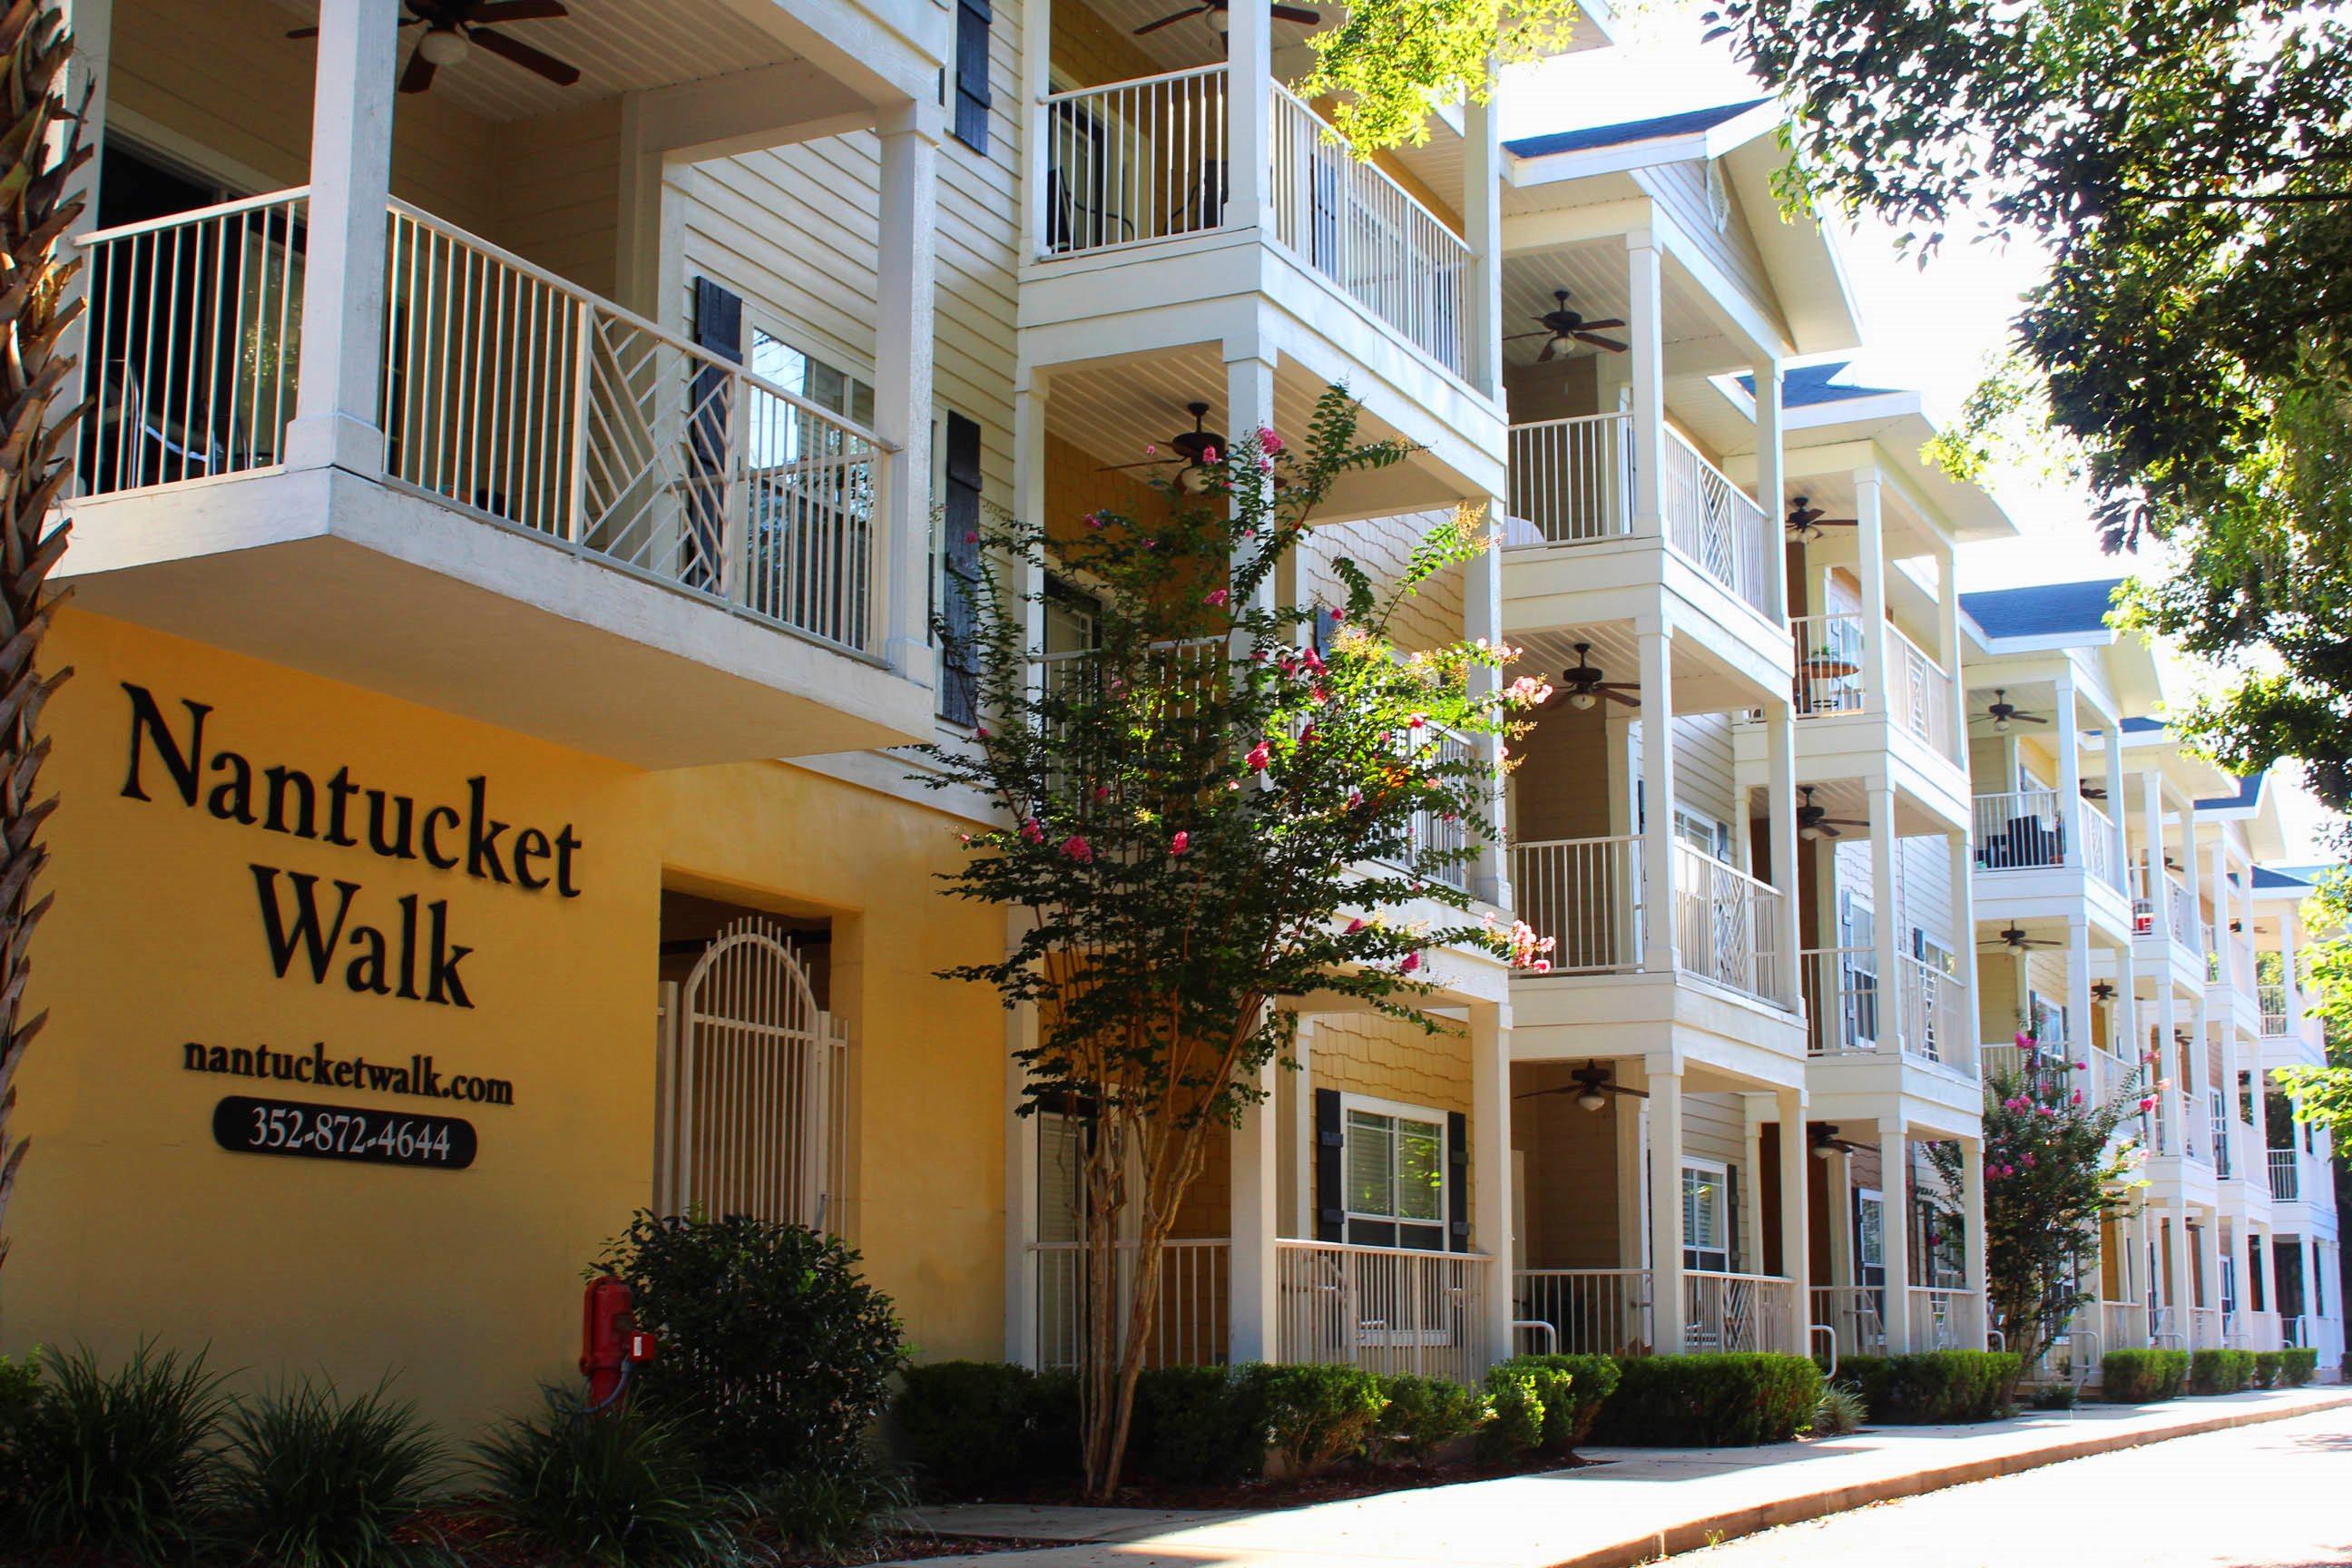 Nantucket Walk Sign 01